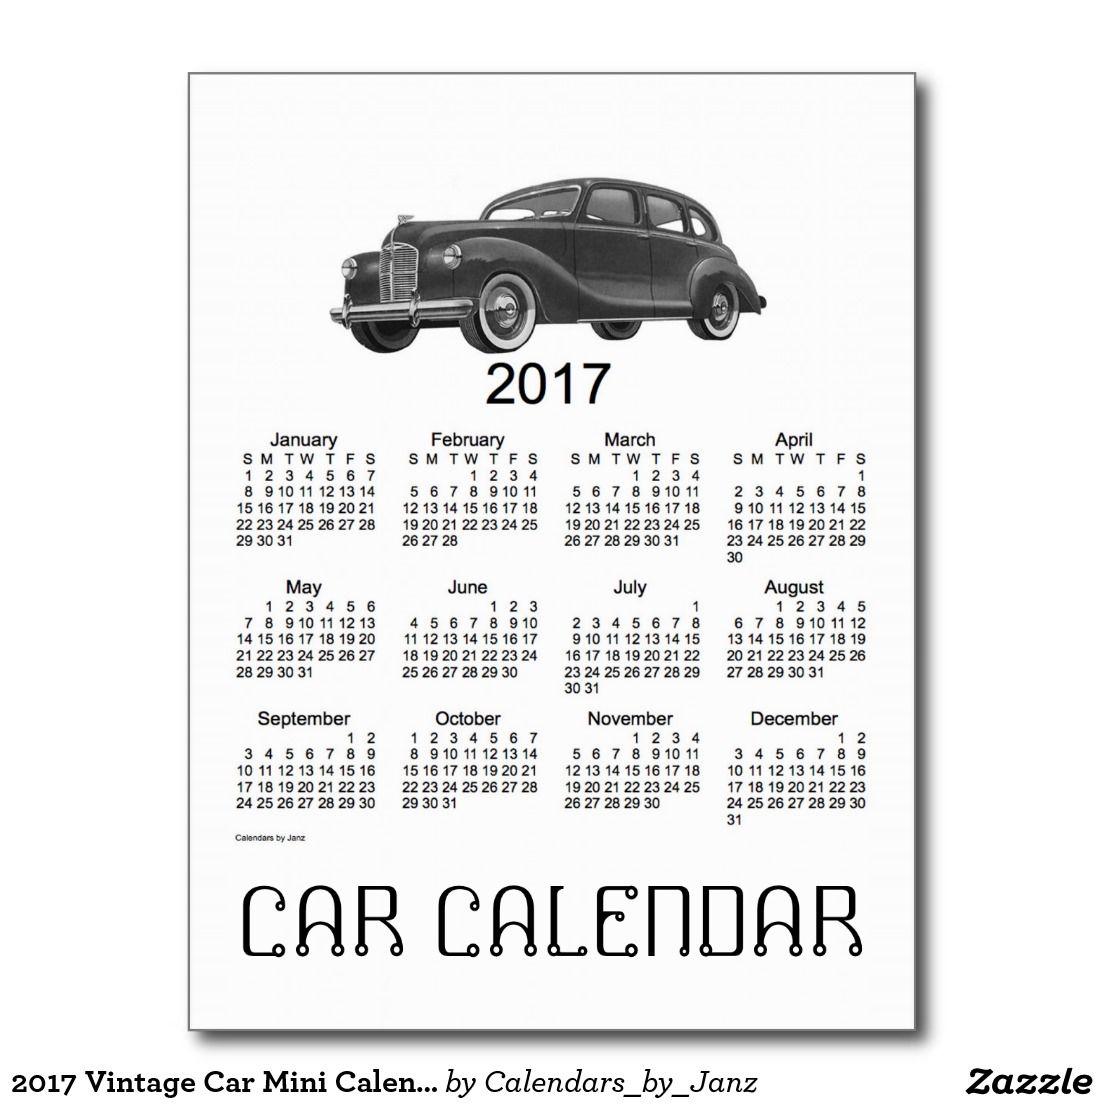 2017 Vintage Car Mini Calendar by Janz Postcard | 2017 Calendars ...